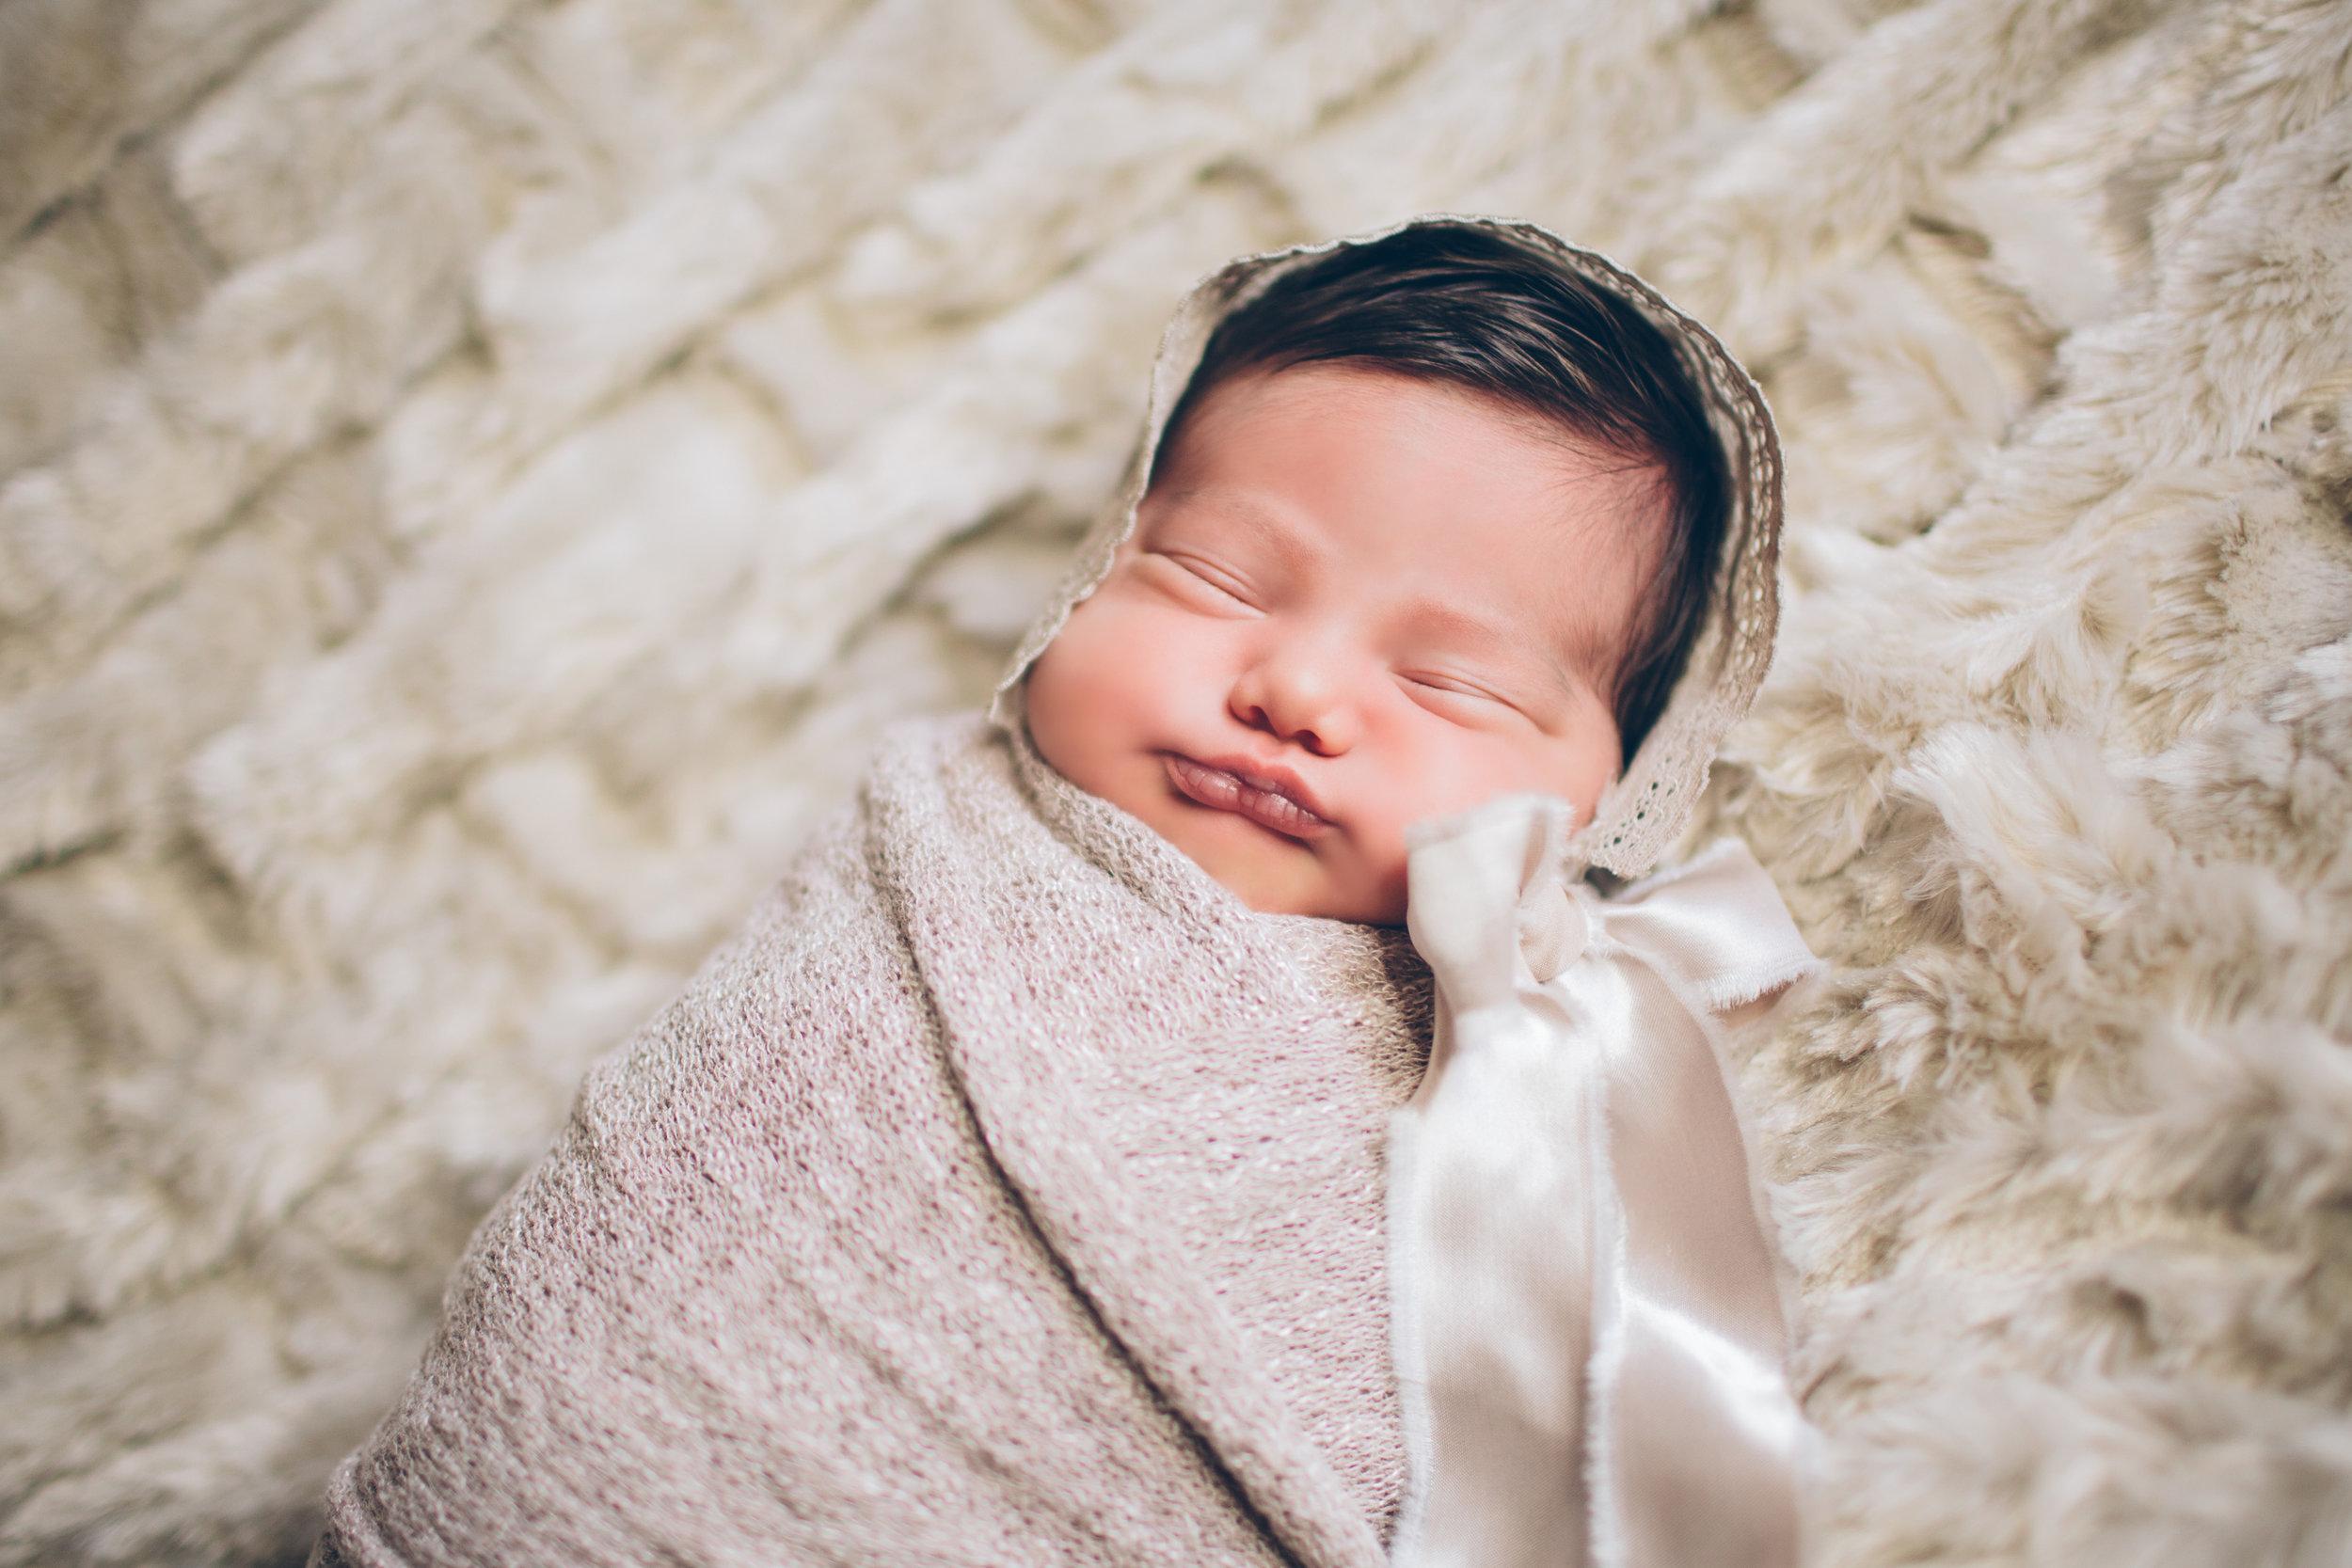 Salphie Markarian Newborn Photo Session-4.jpg